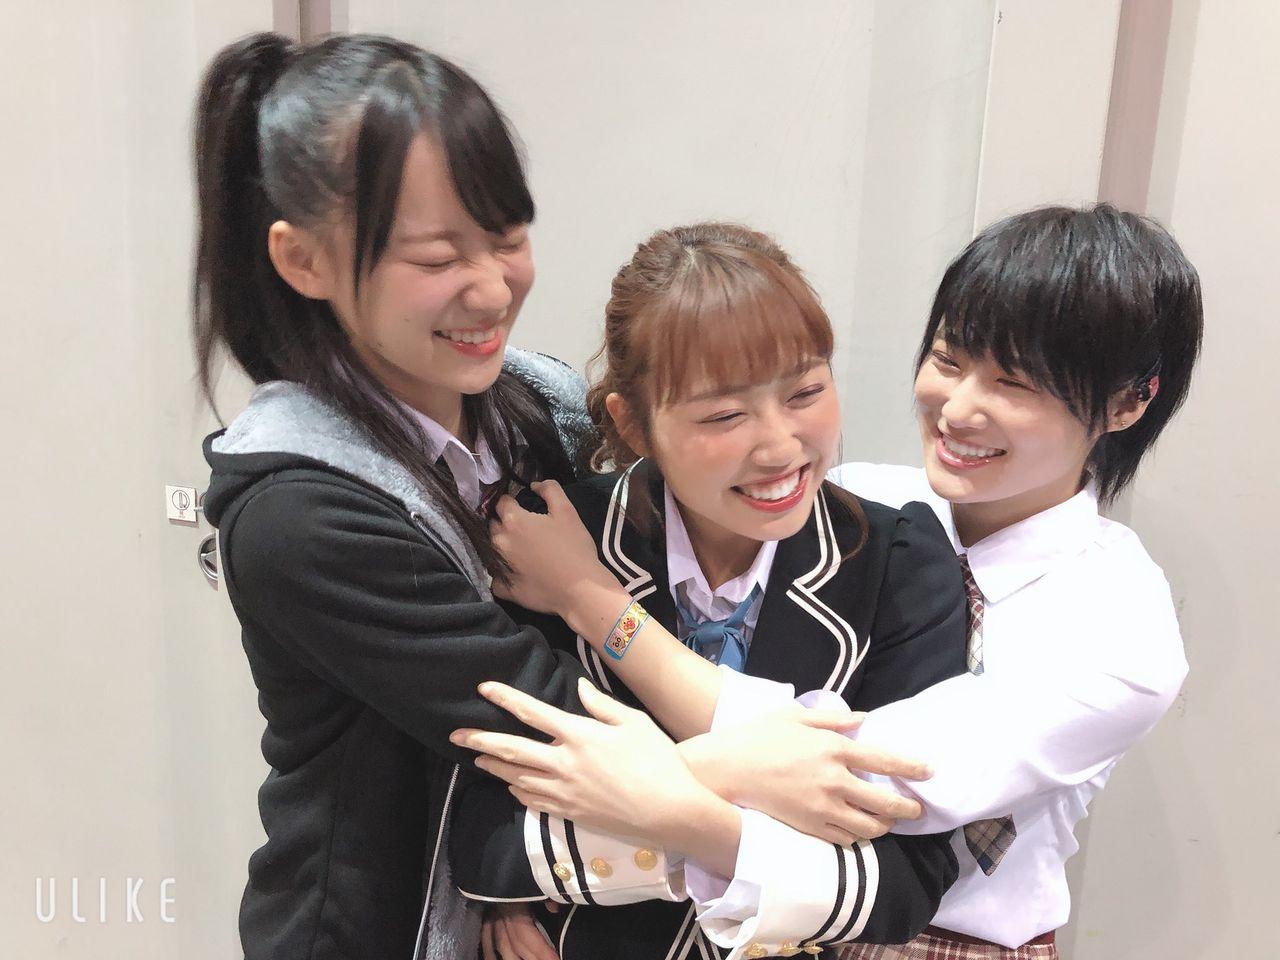 【NMB48】毎年恒例インフル注射キタジョ━━(゚∀゚)━━!!